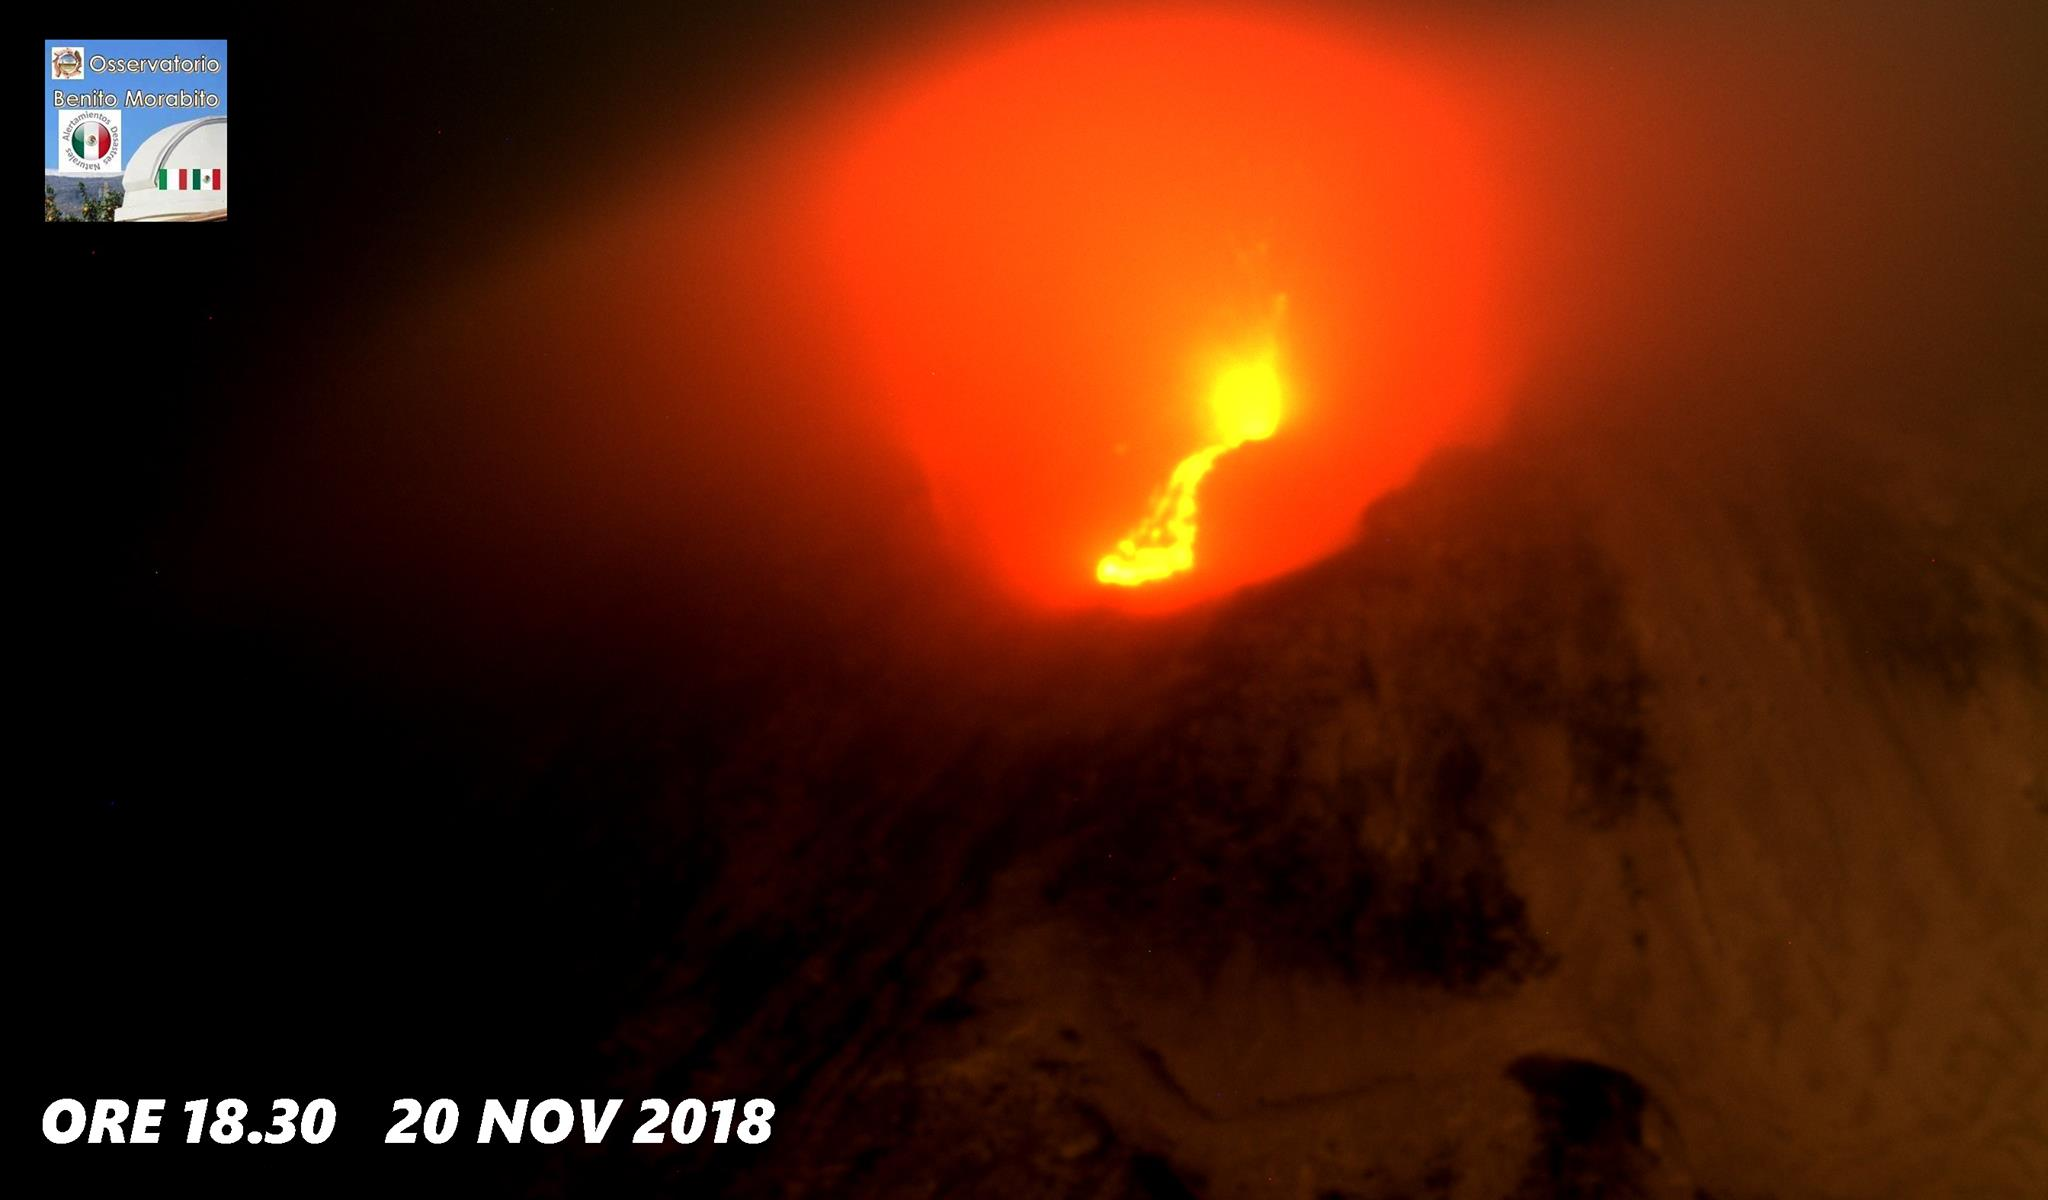 21 Novembre 2018. FR. Italie / Sicile : Etna , Colombie : Chiles / Cerro Negro , Archipel du Vanuatu : Yasur , Guatemala : Pacaya .